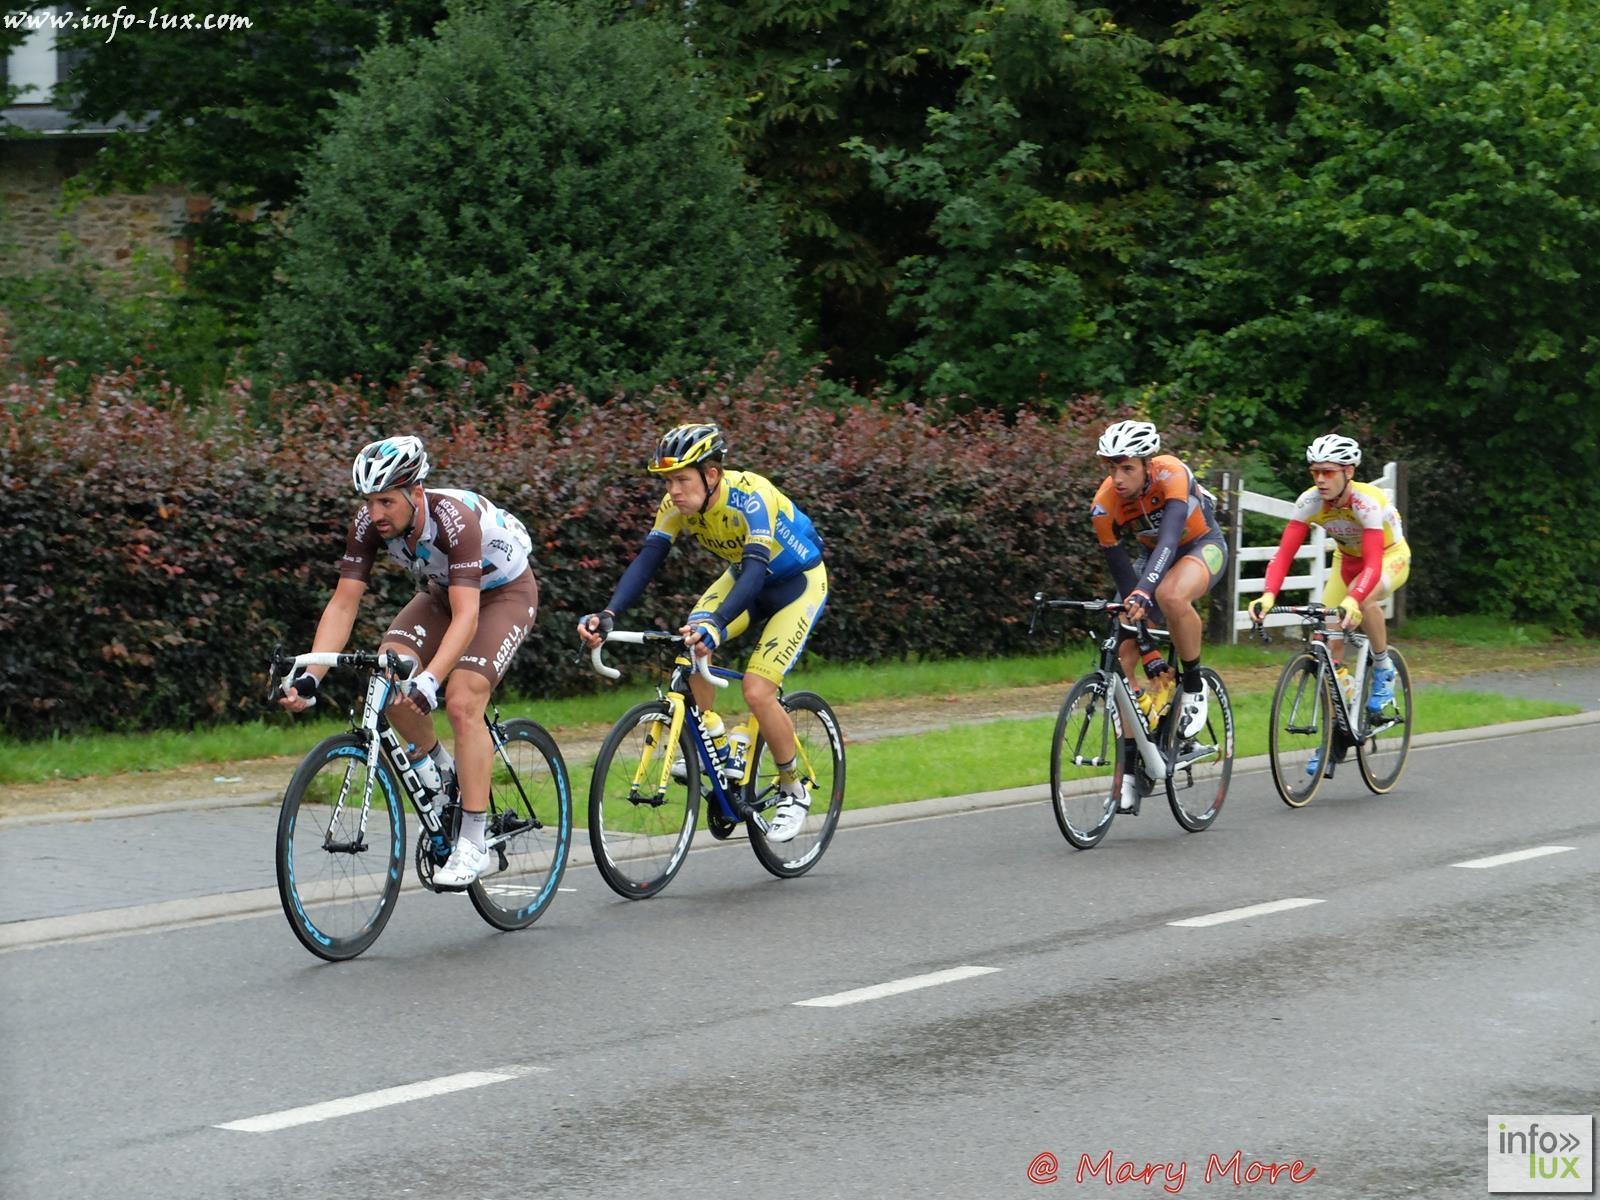 Tour de Wallonie photos de Daverdisse 2014